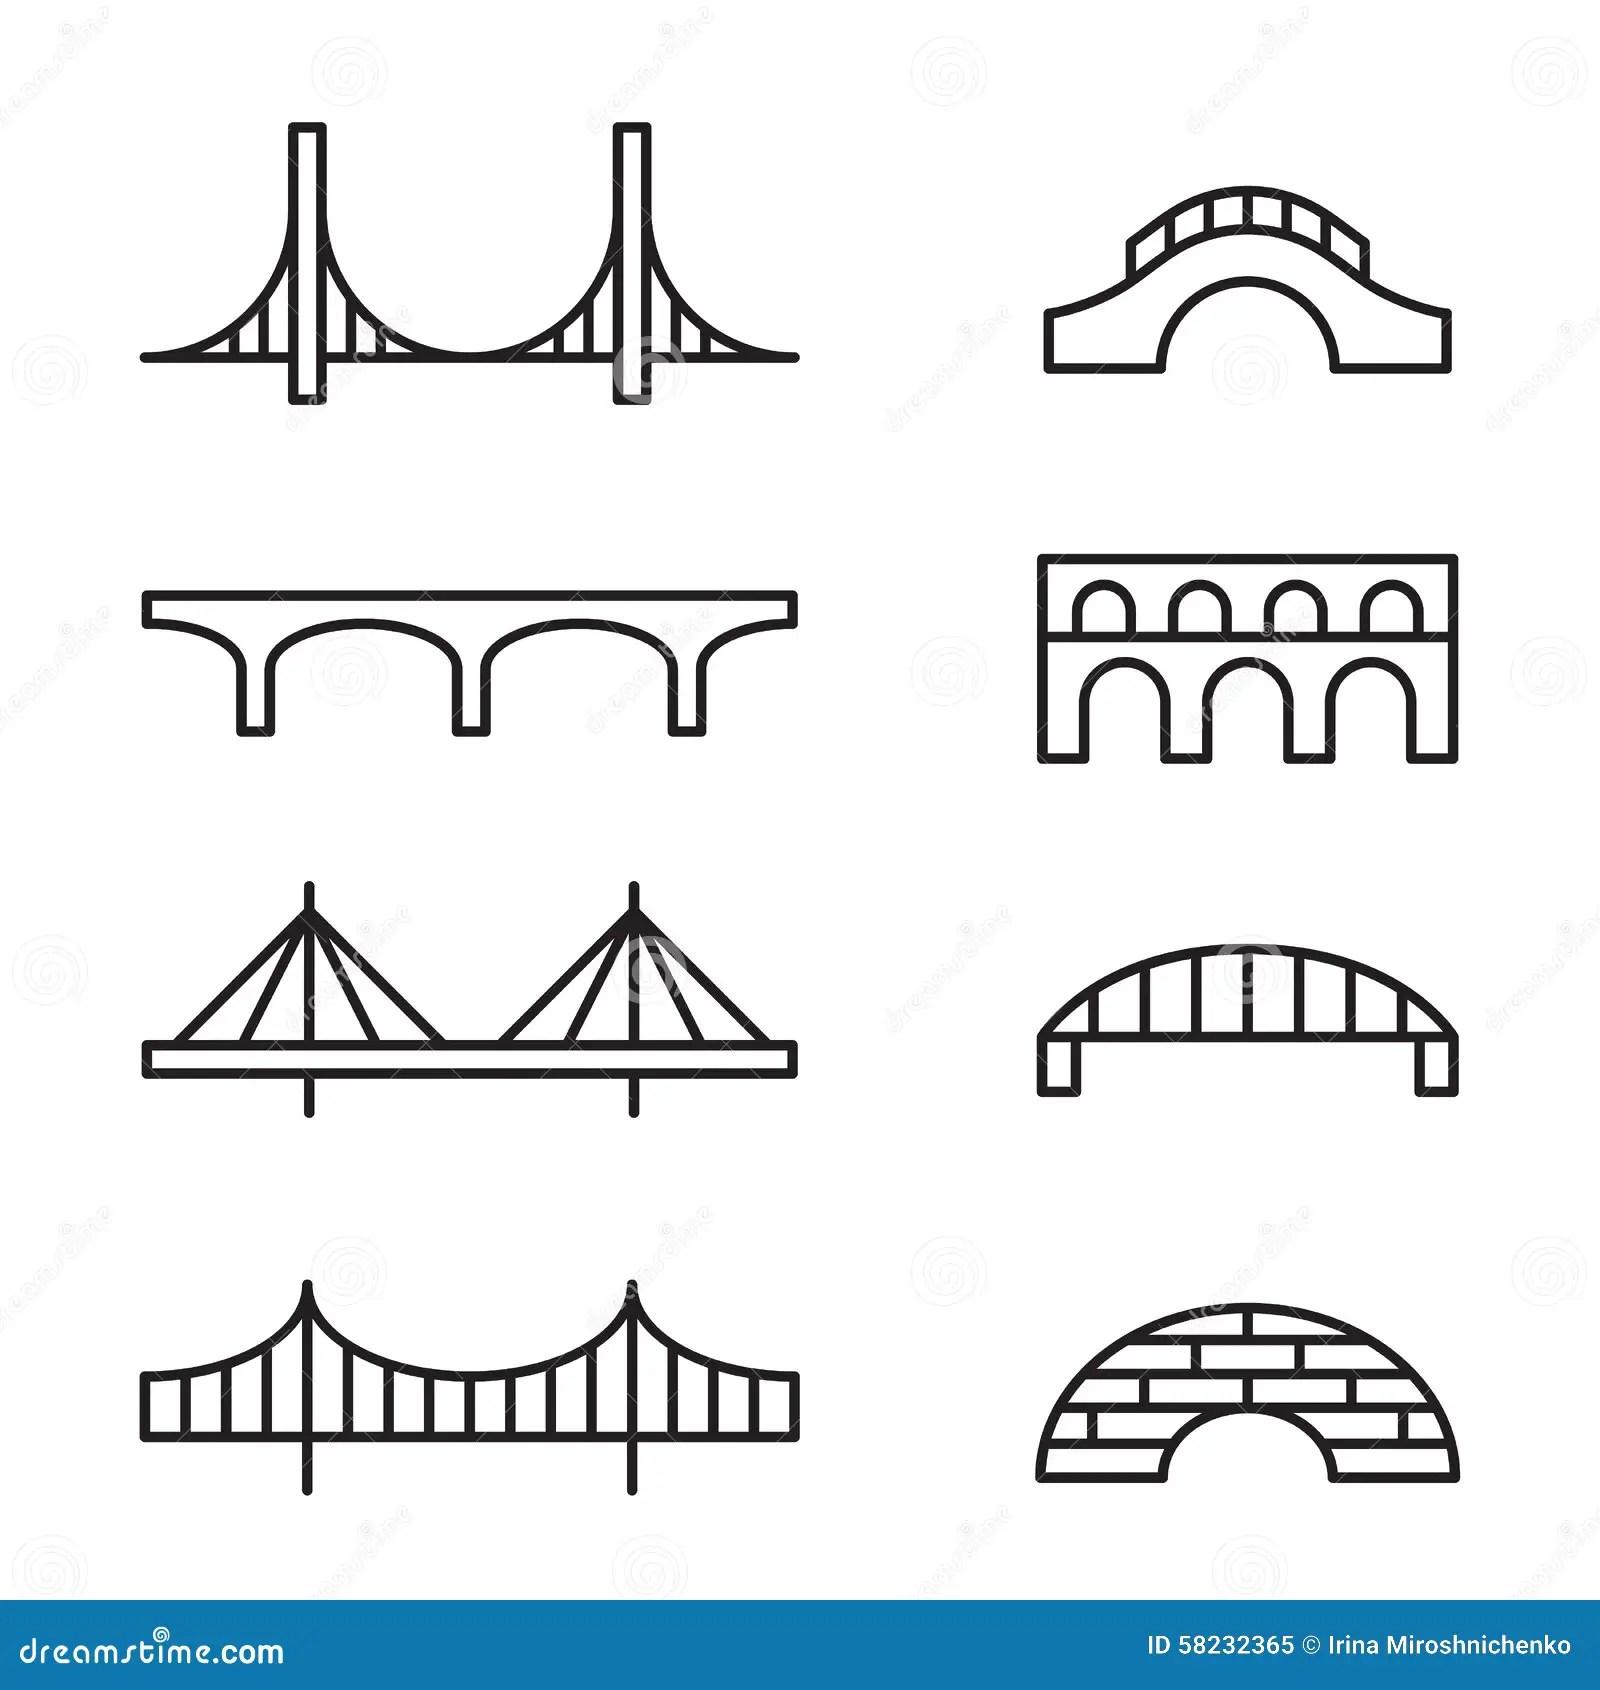 Bridge Icons Stock Vector Illustration Of Simple Design